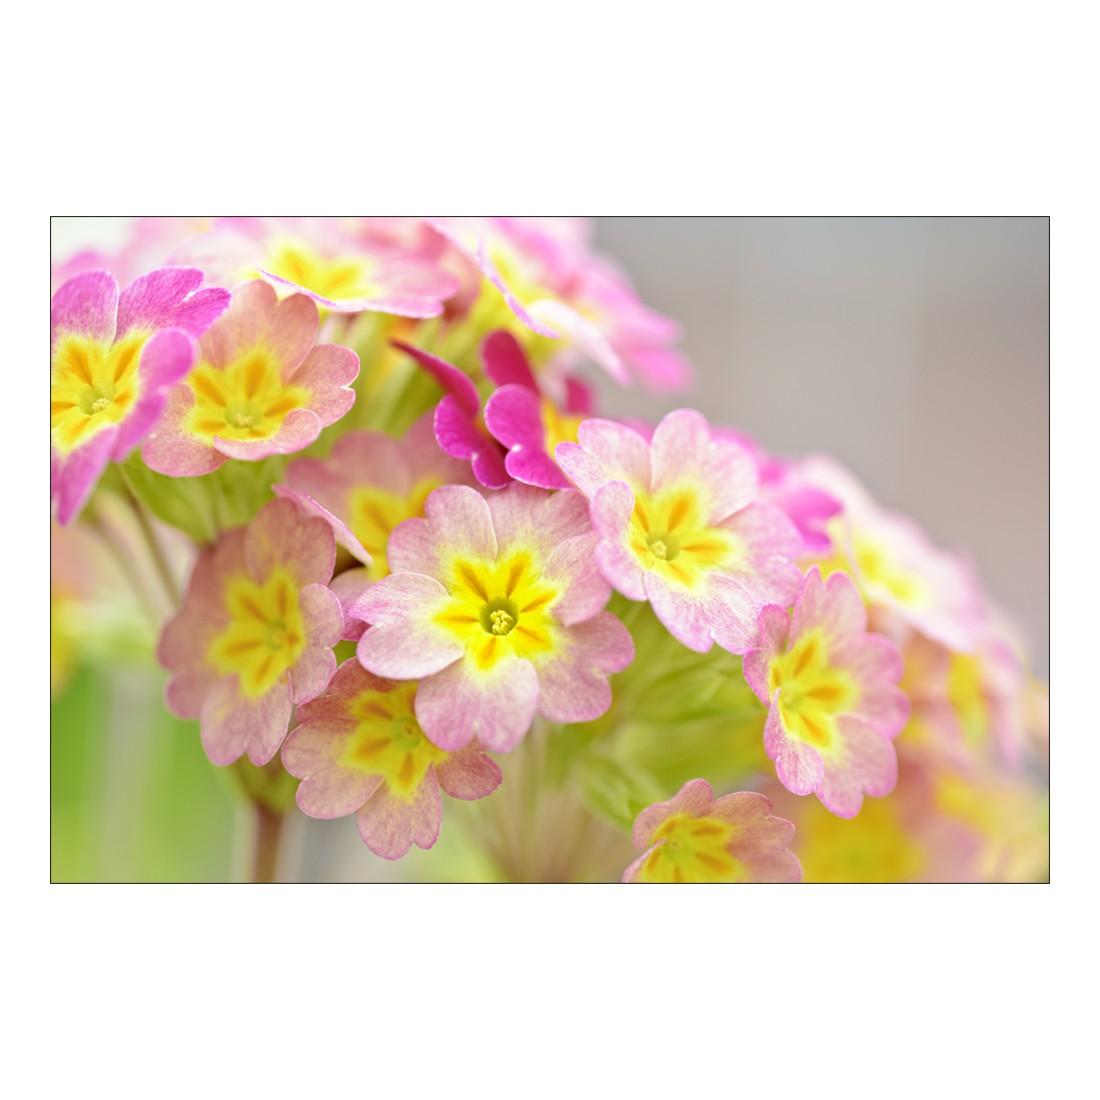 Acrylglasbild Sunny Flowers – Abmessung 75×50 cm, Gallery of Innovative Art jetzt bestellen